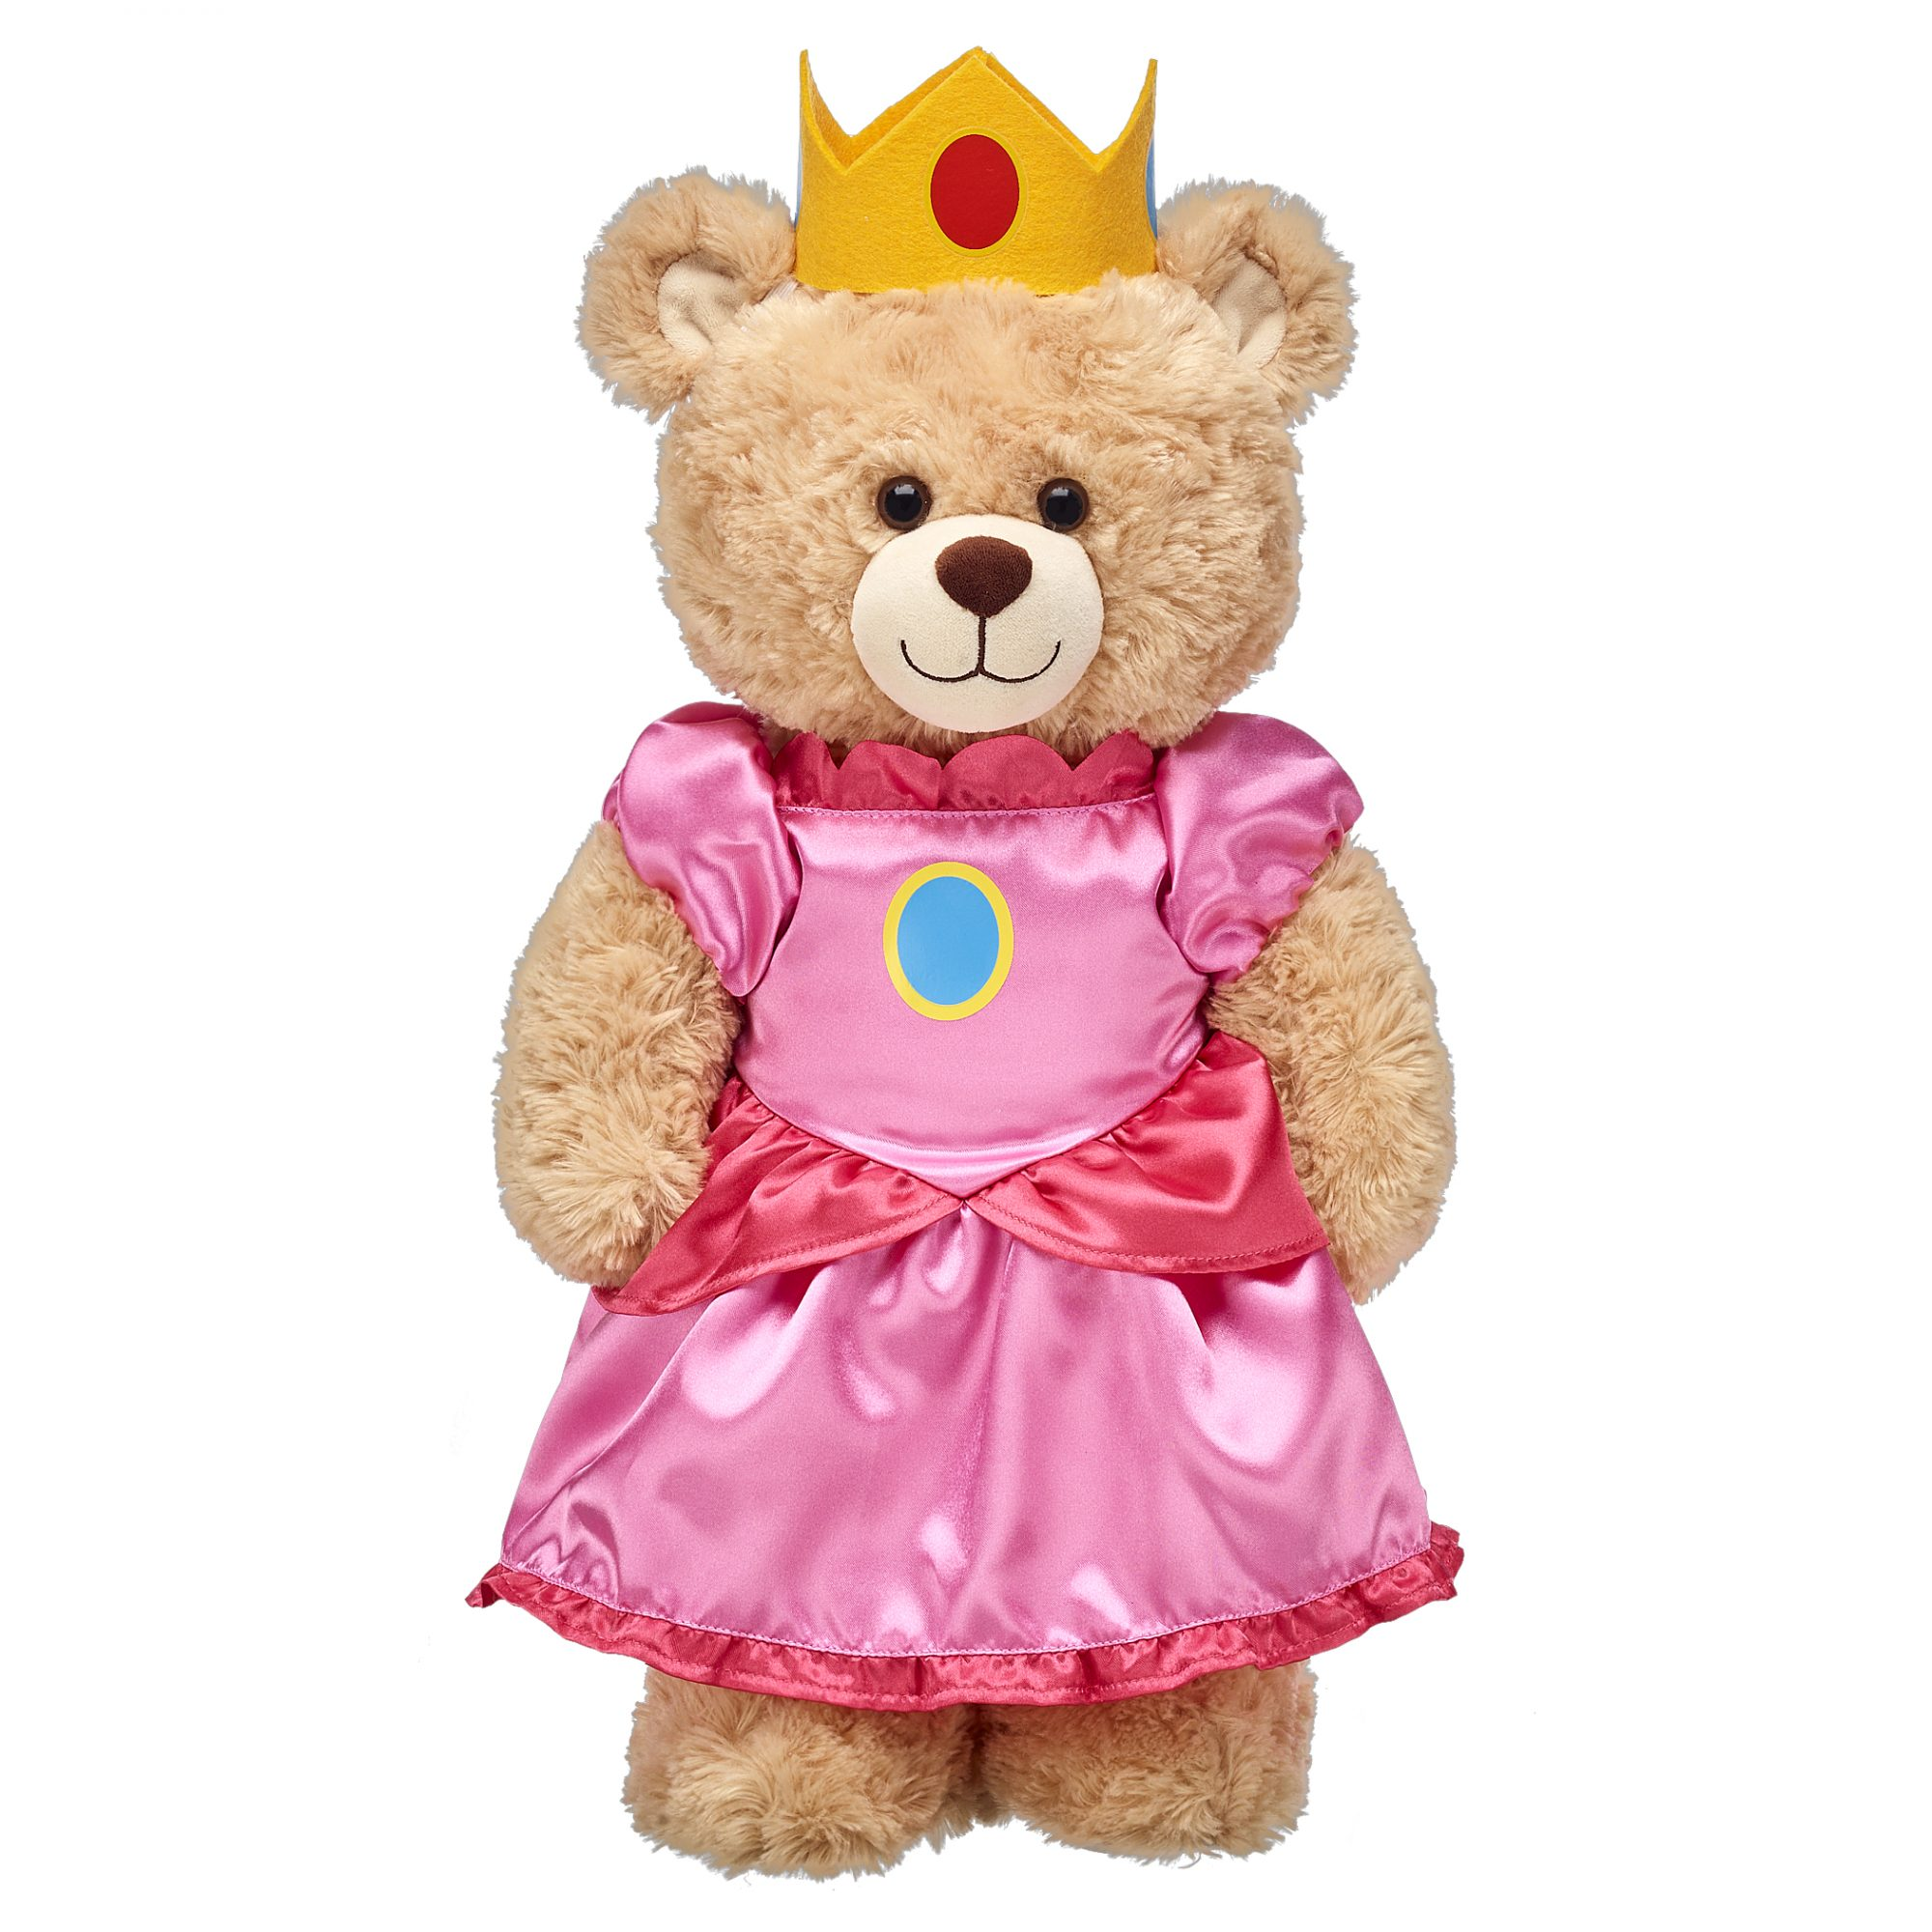 Princess-Peach-Costume-2.jpeg